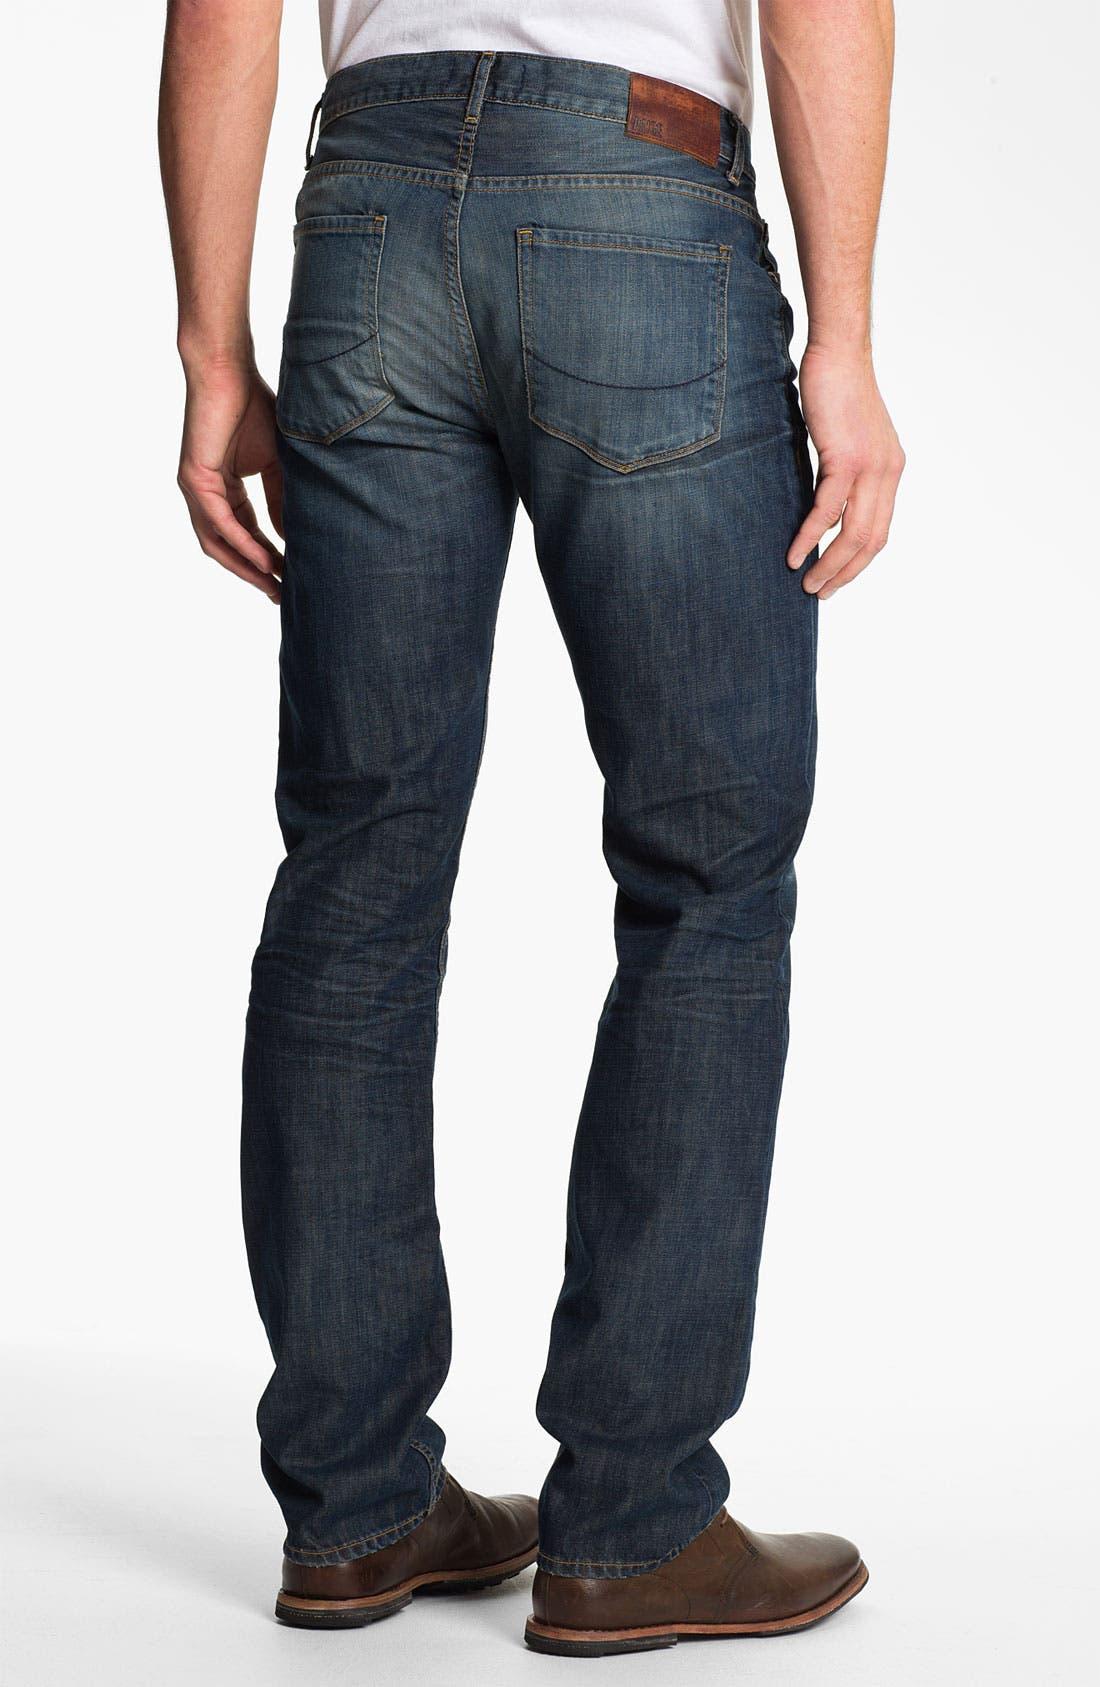 Alternate Image 1 Selected - PAIGE 'Normandie' Slim Straight Leg Jeans (Castaway)